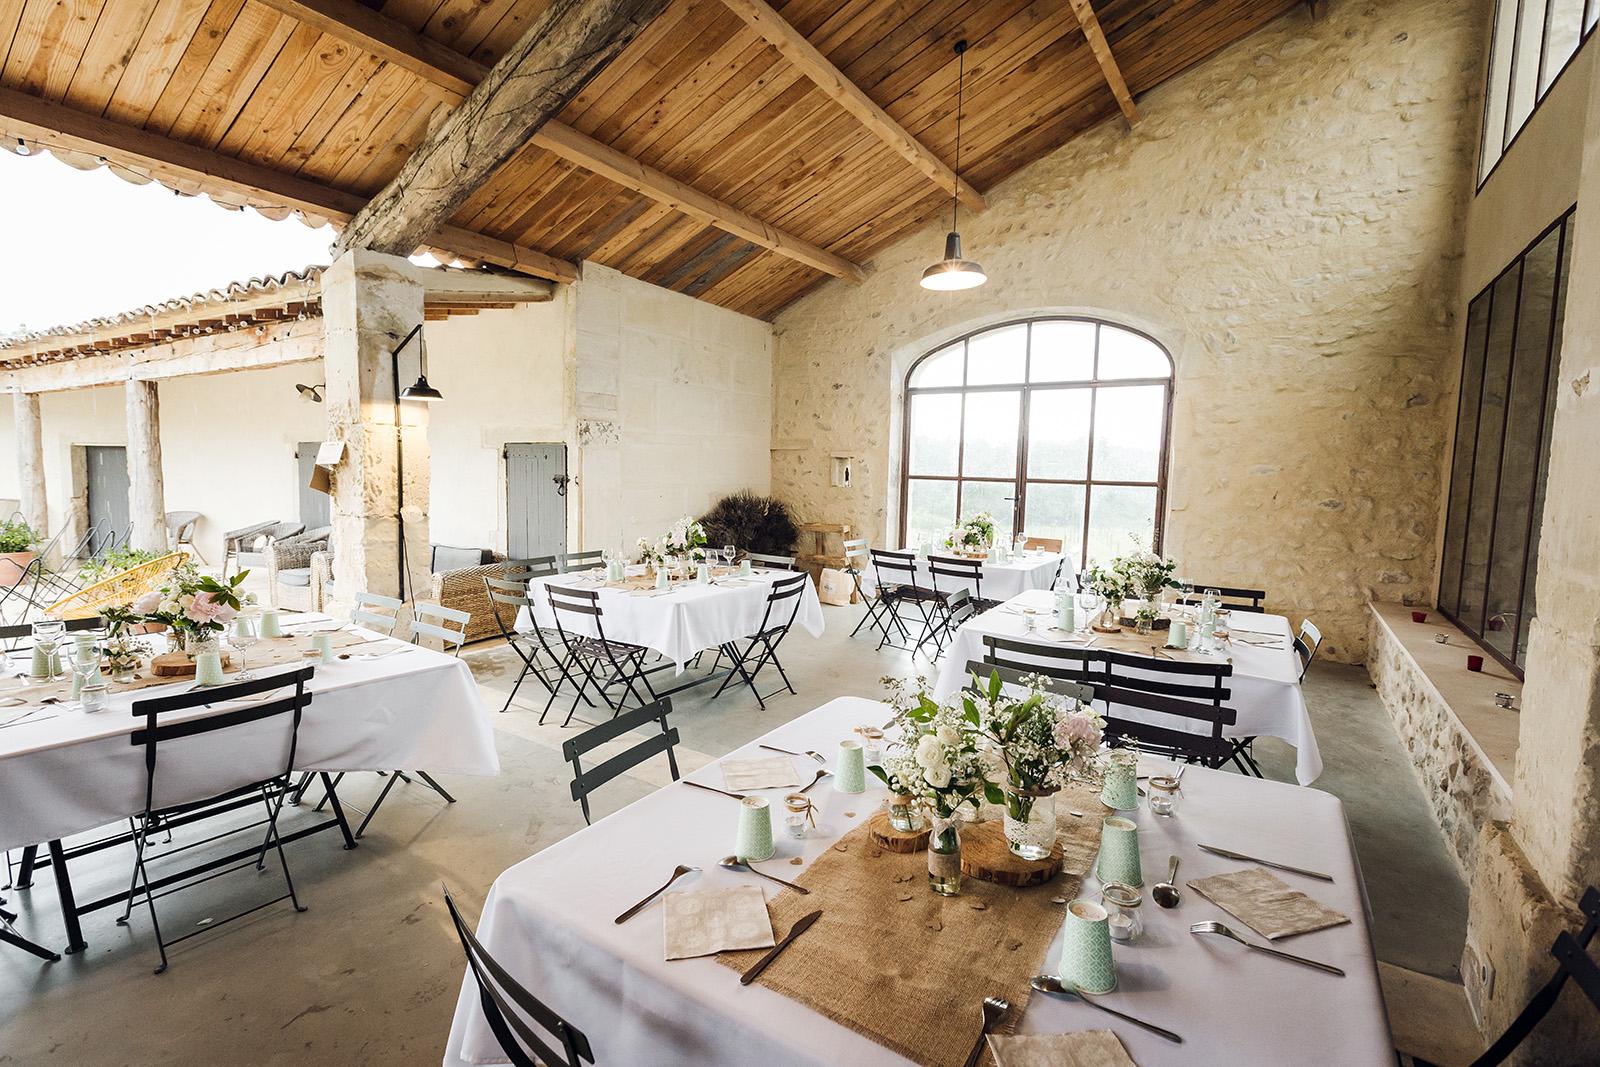 mariage-wedding-reportage-decoration-mas-de-saint-chetin-valreas-vaison-la-romaine-provence-alpes-cote-dazur-vaucluse-elise-julliard-photographe